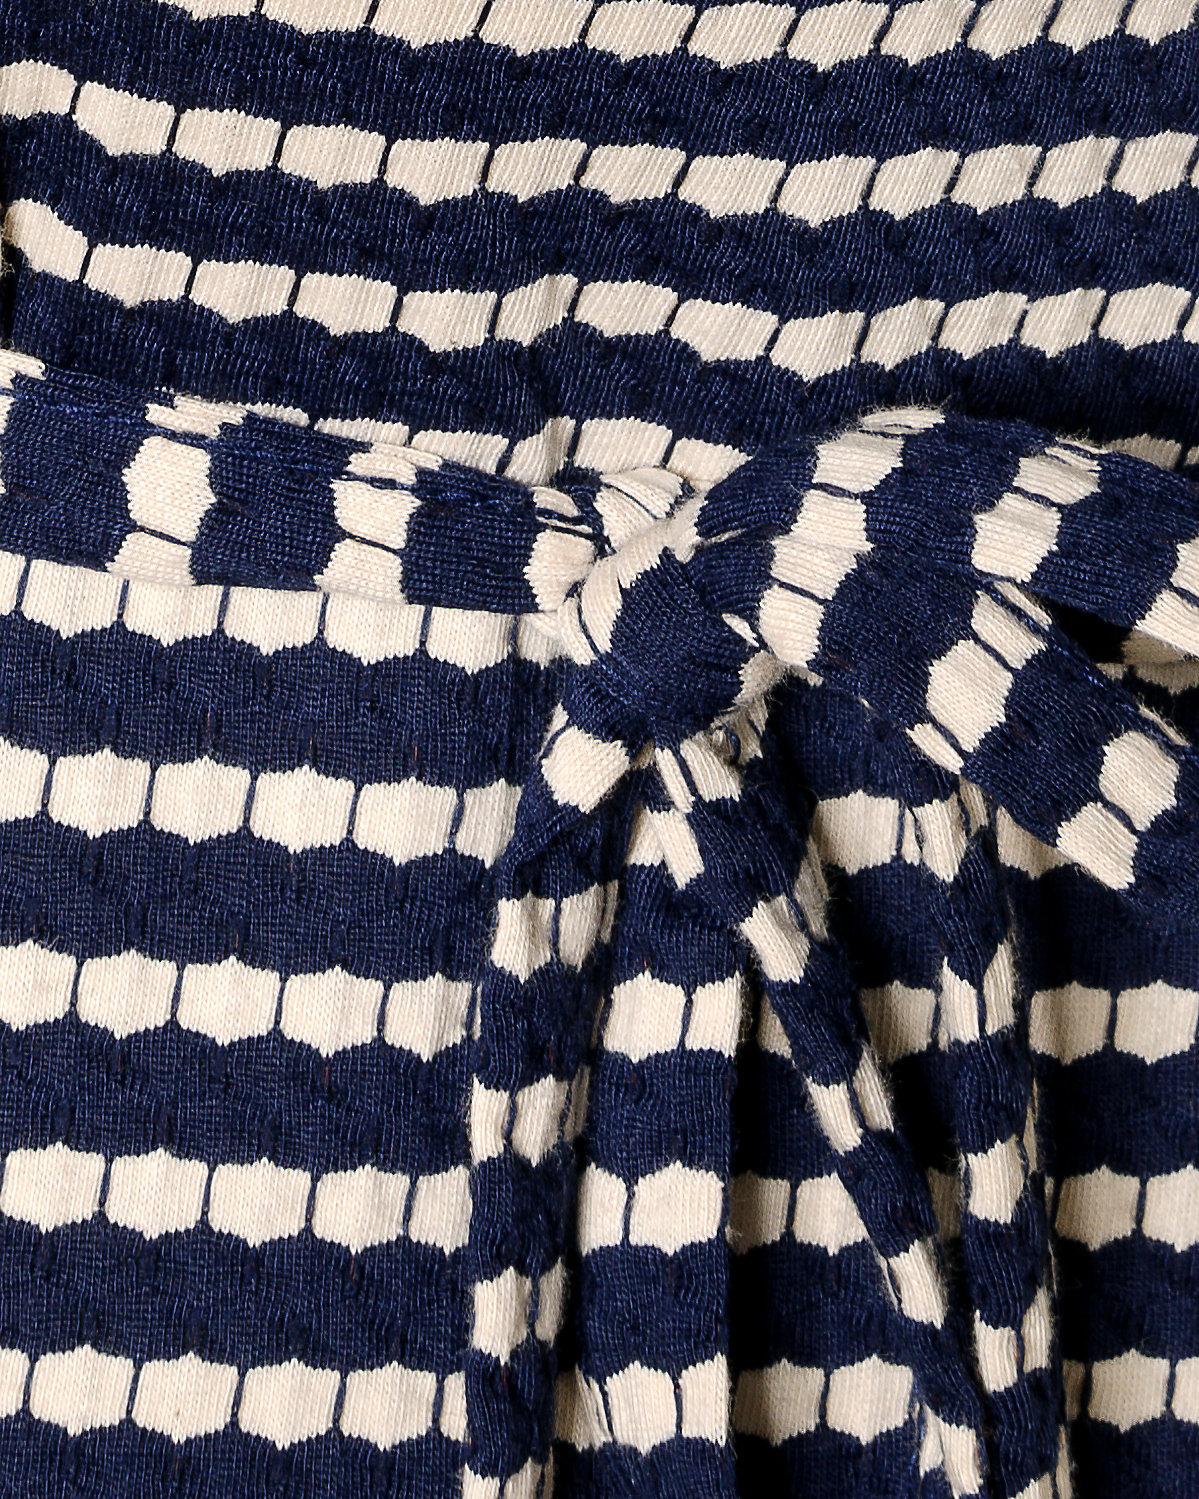 weiblich Neu mamalicious MLALUNA S//S ABK JERSEY DRESS A Umstandskleider